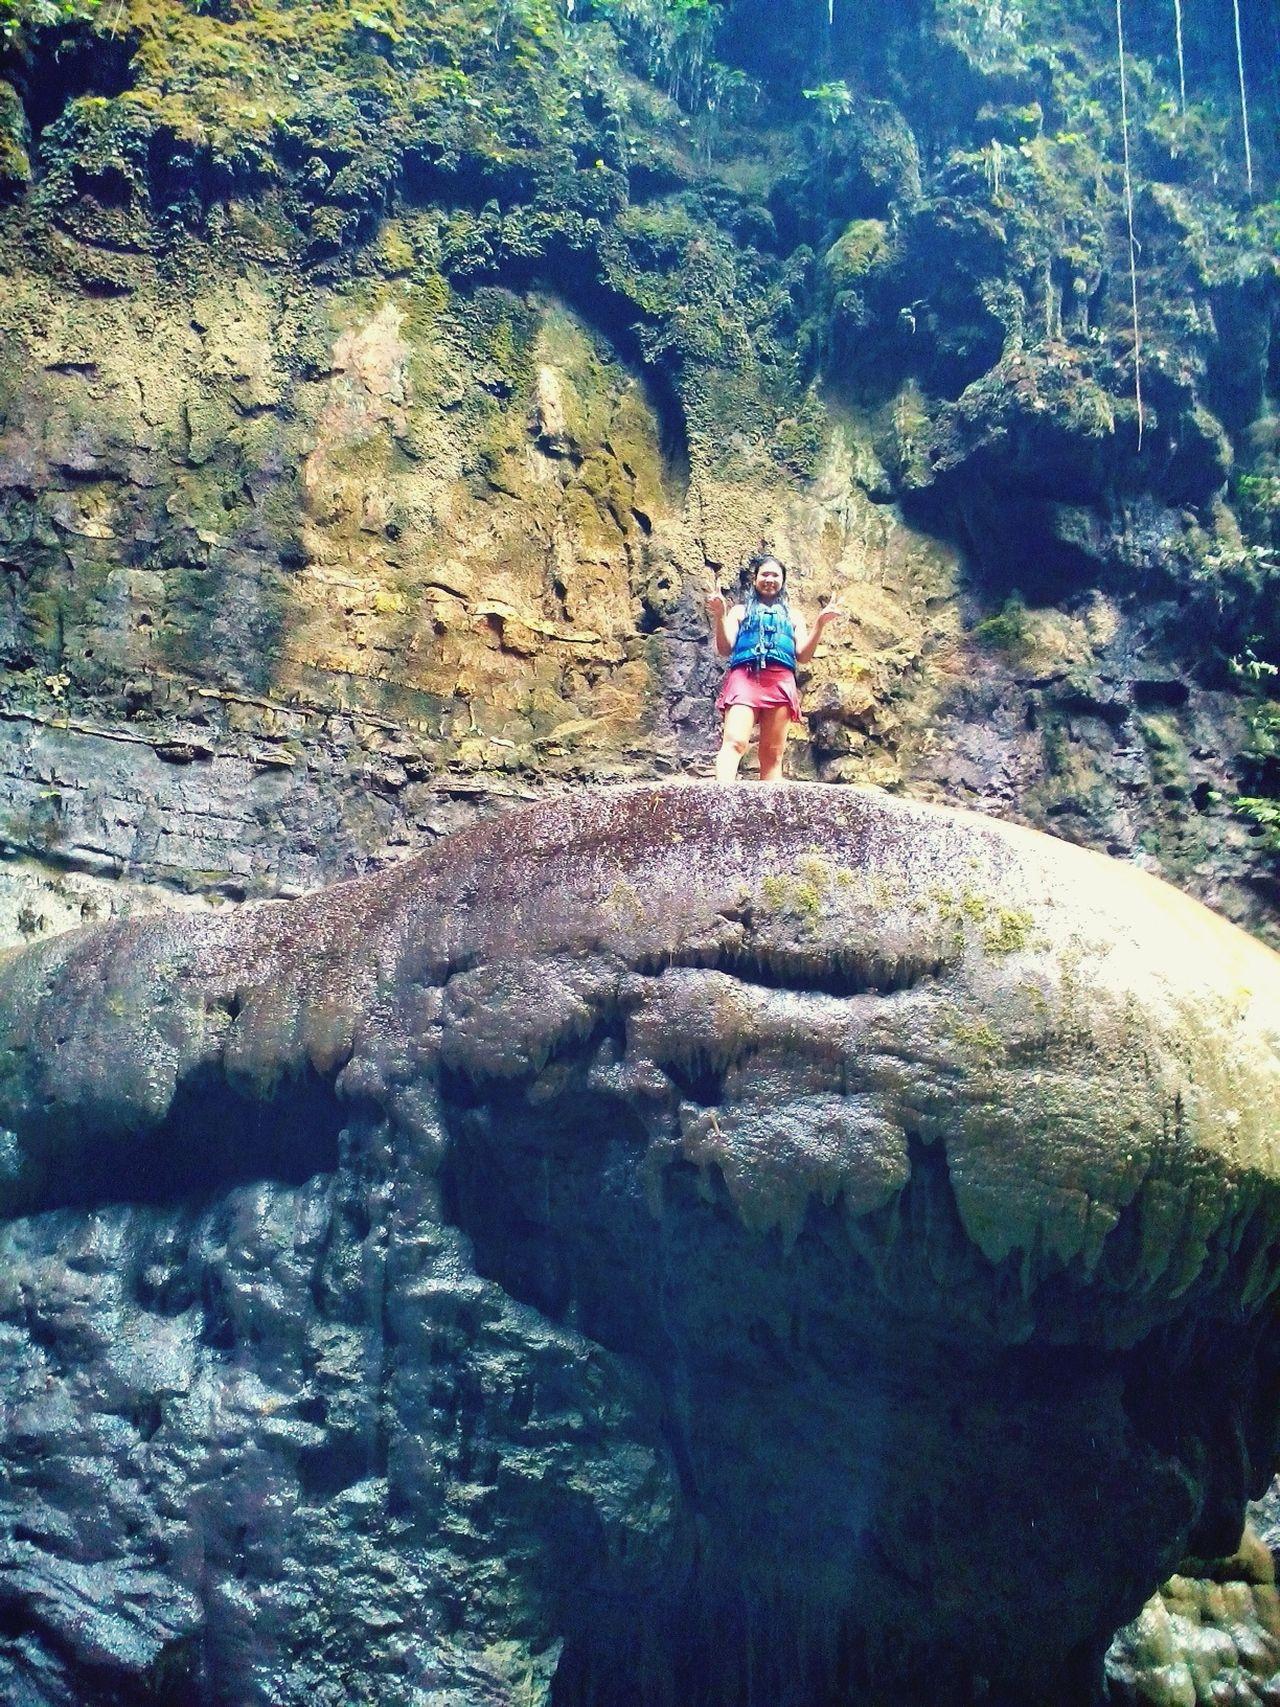 Naturelover Rafting Rock Formation Daredevil Jump! Greencanyon  INDONESIA